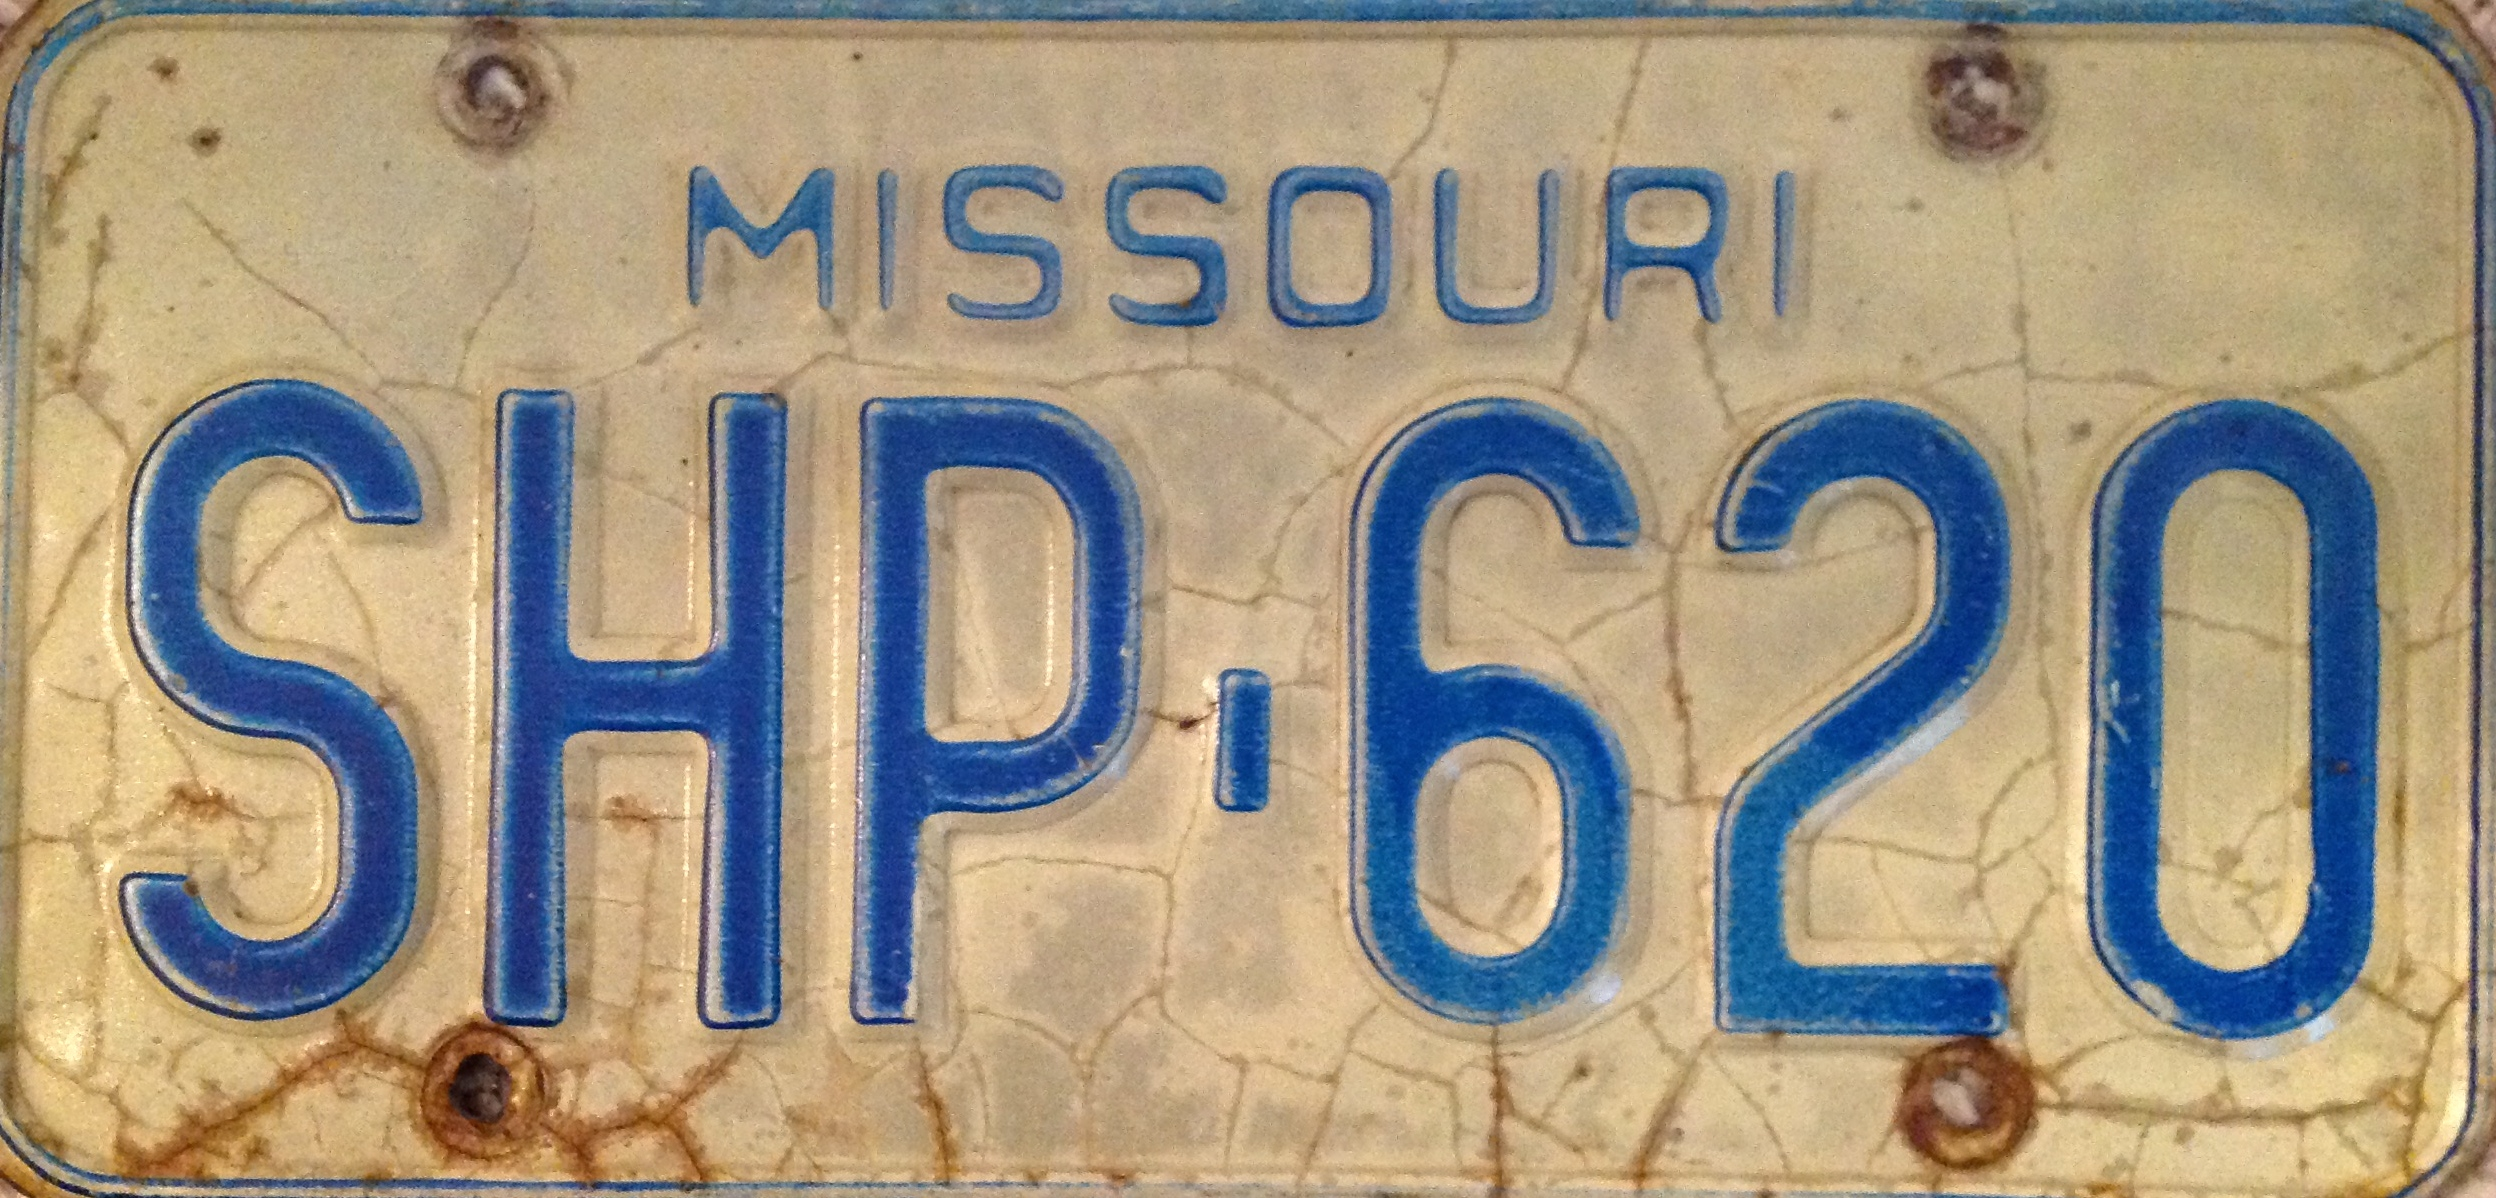 Missouri-Highway-Patrol History